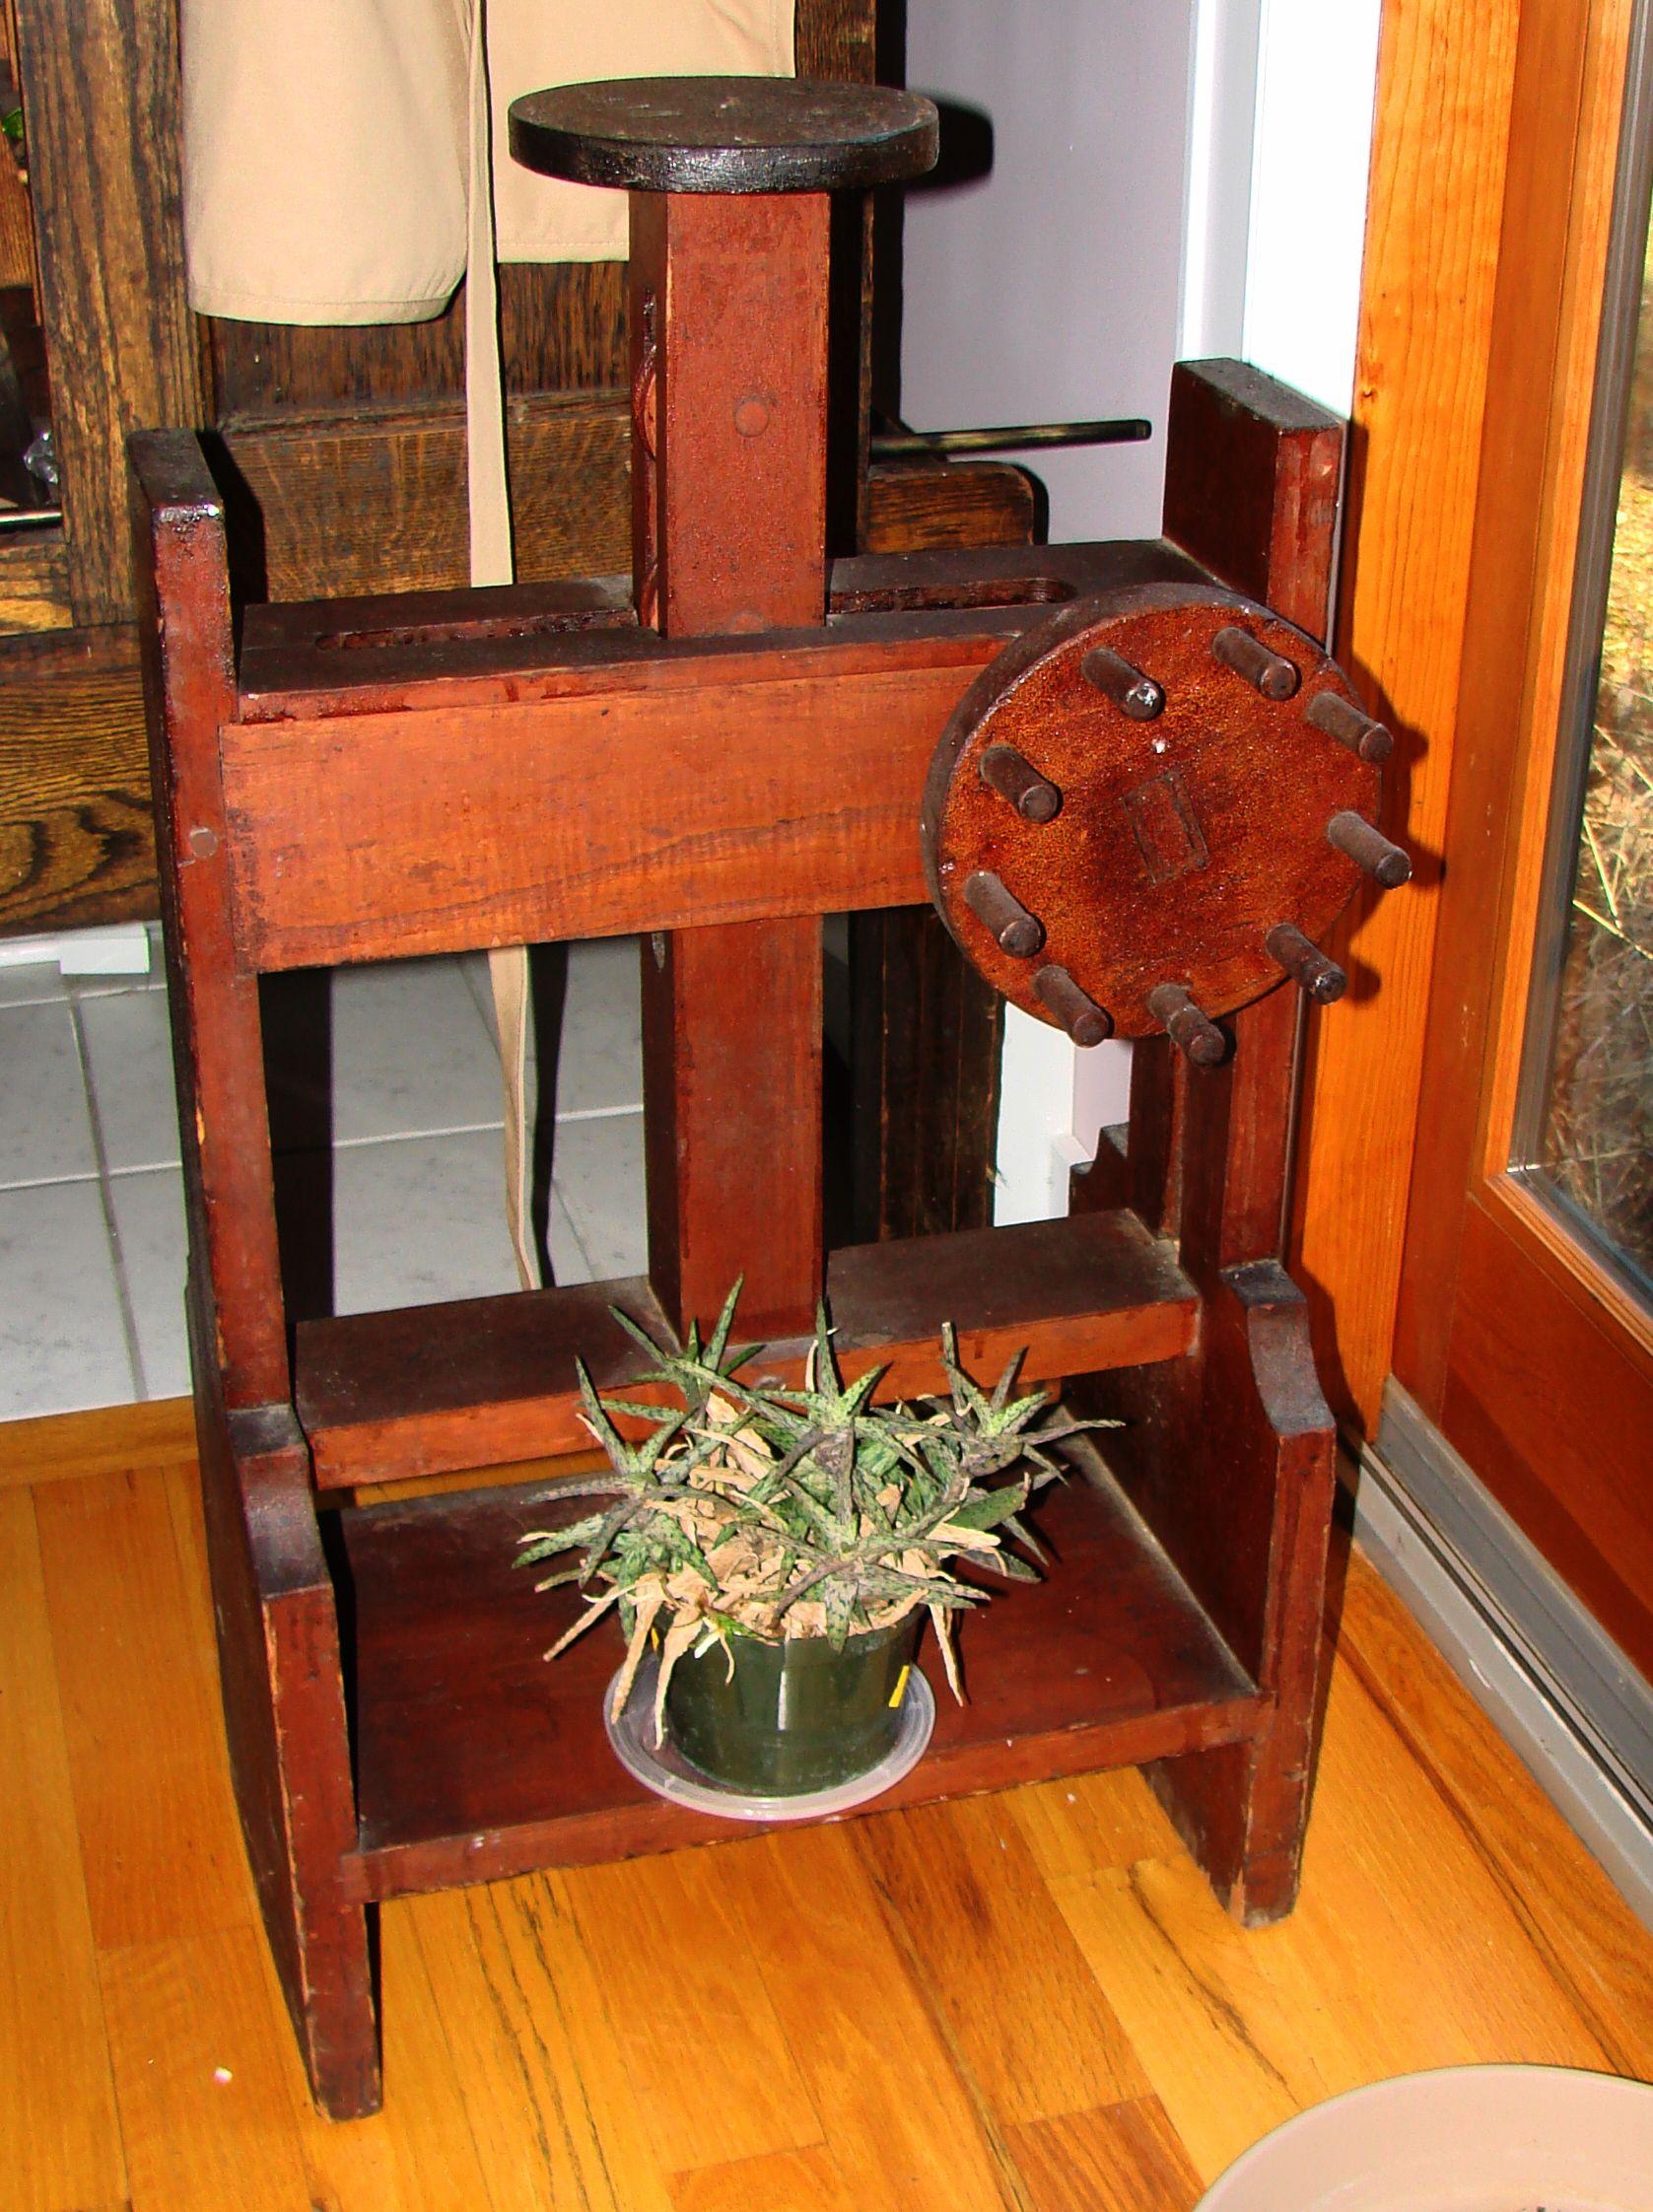 Antique Cheese Press With Images Antique Bucket Vintage Kitchenware Decorative Pieces